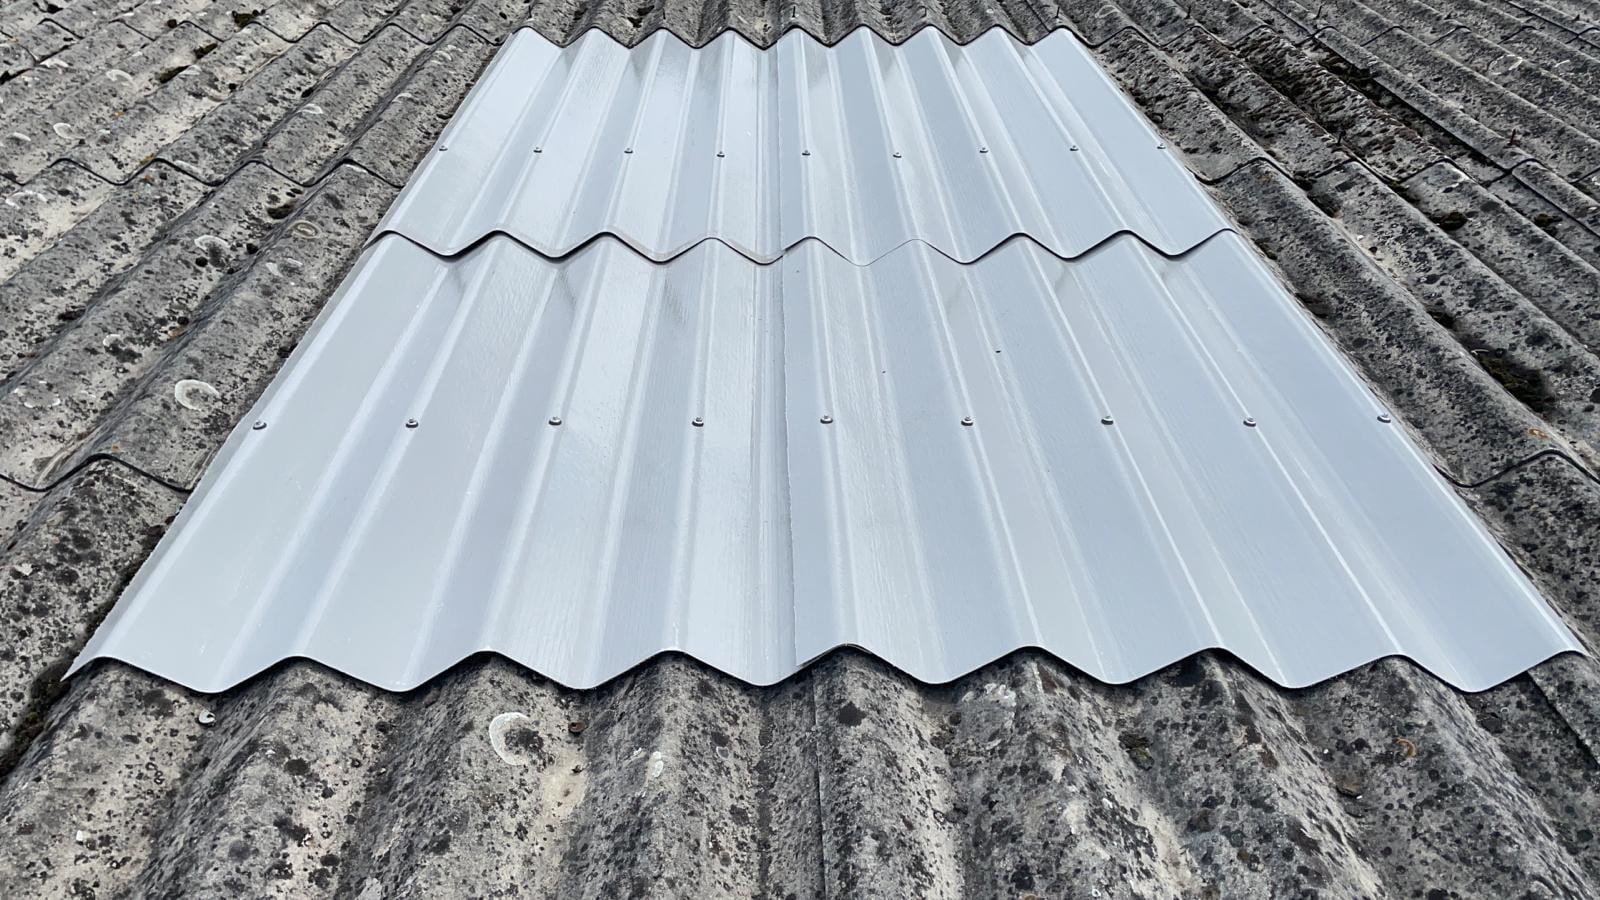 Roof repairs to a Factory - Warehouse roof in Weybridge Surrey